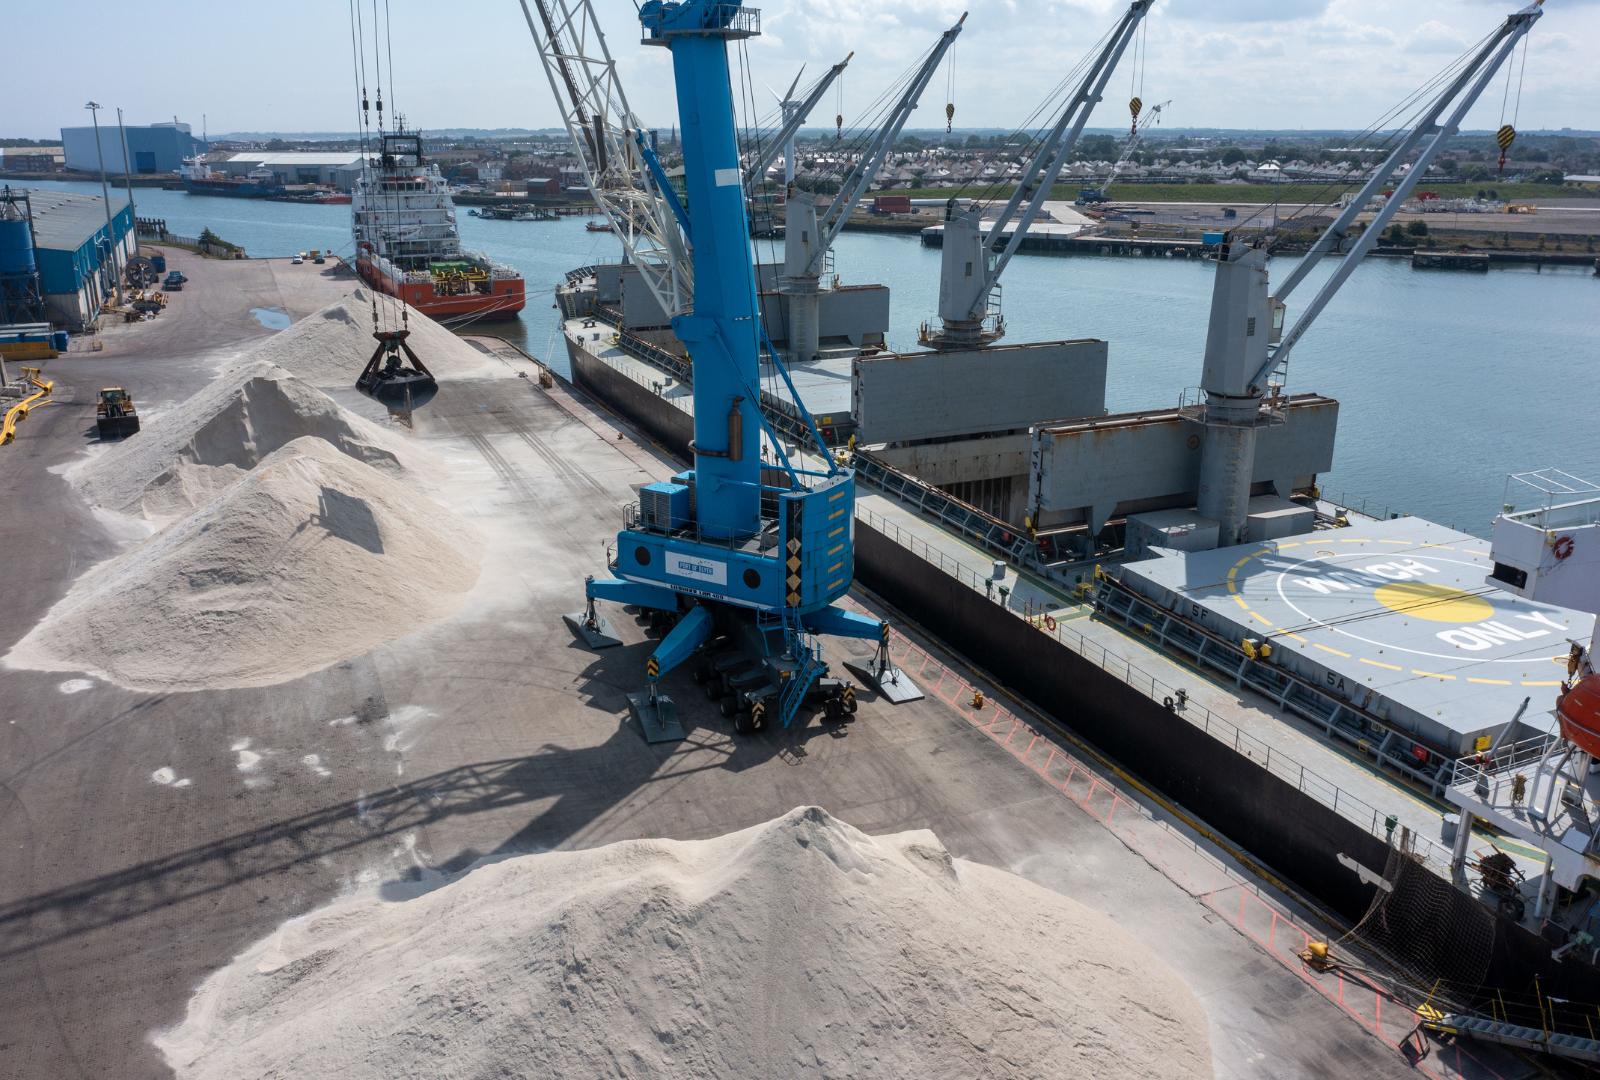 Largest cargo